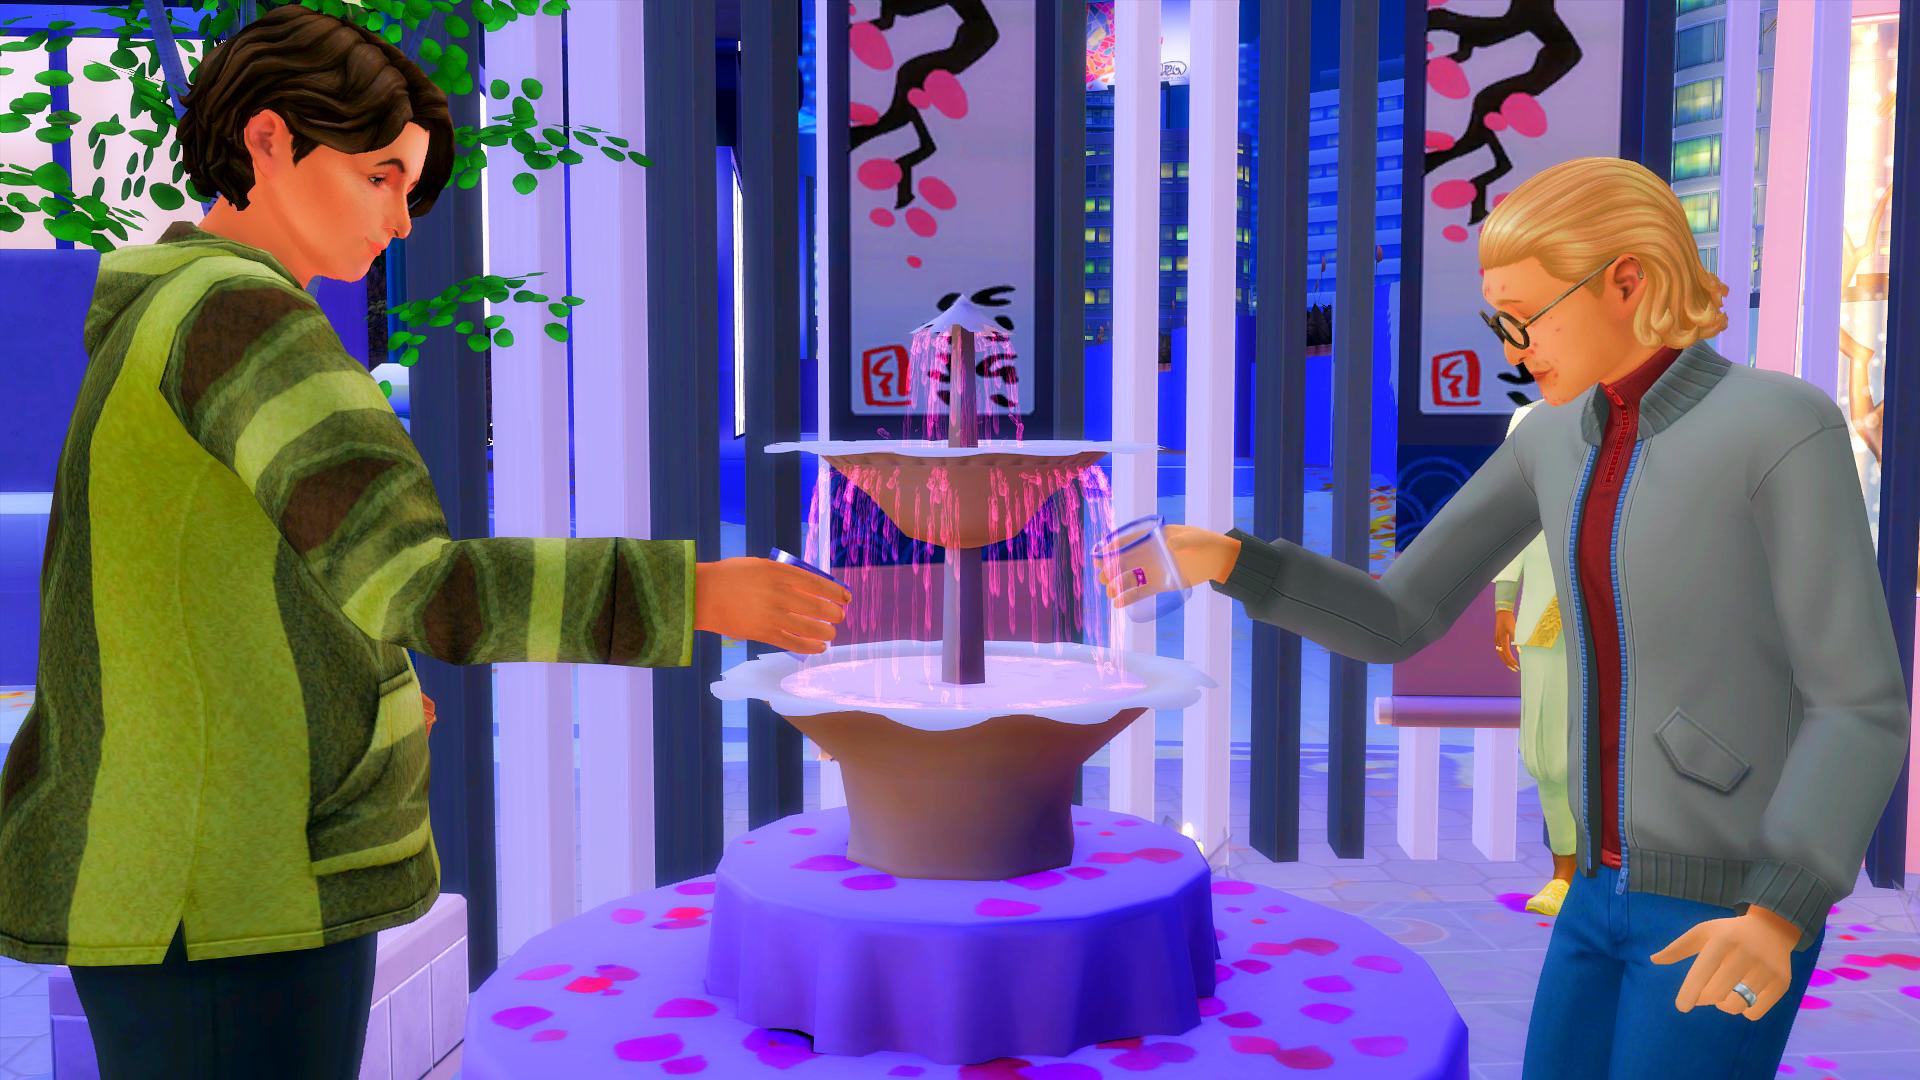 Pouring-Sakura-Tea-Together.png